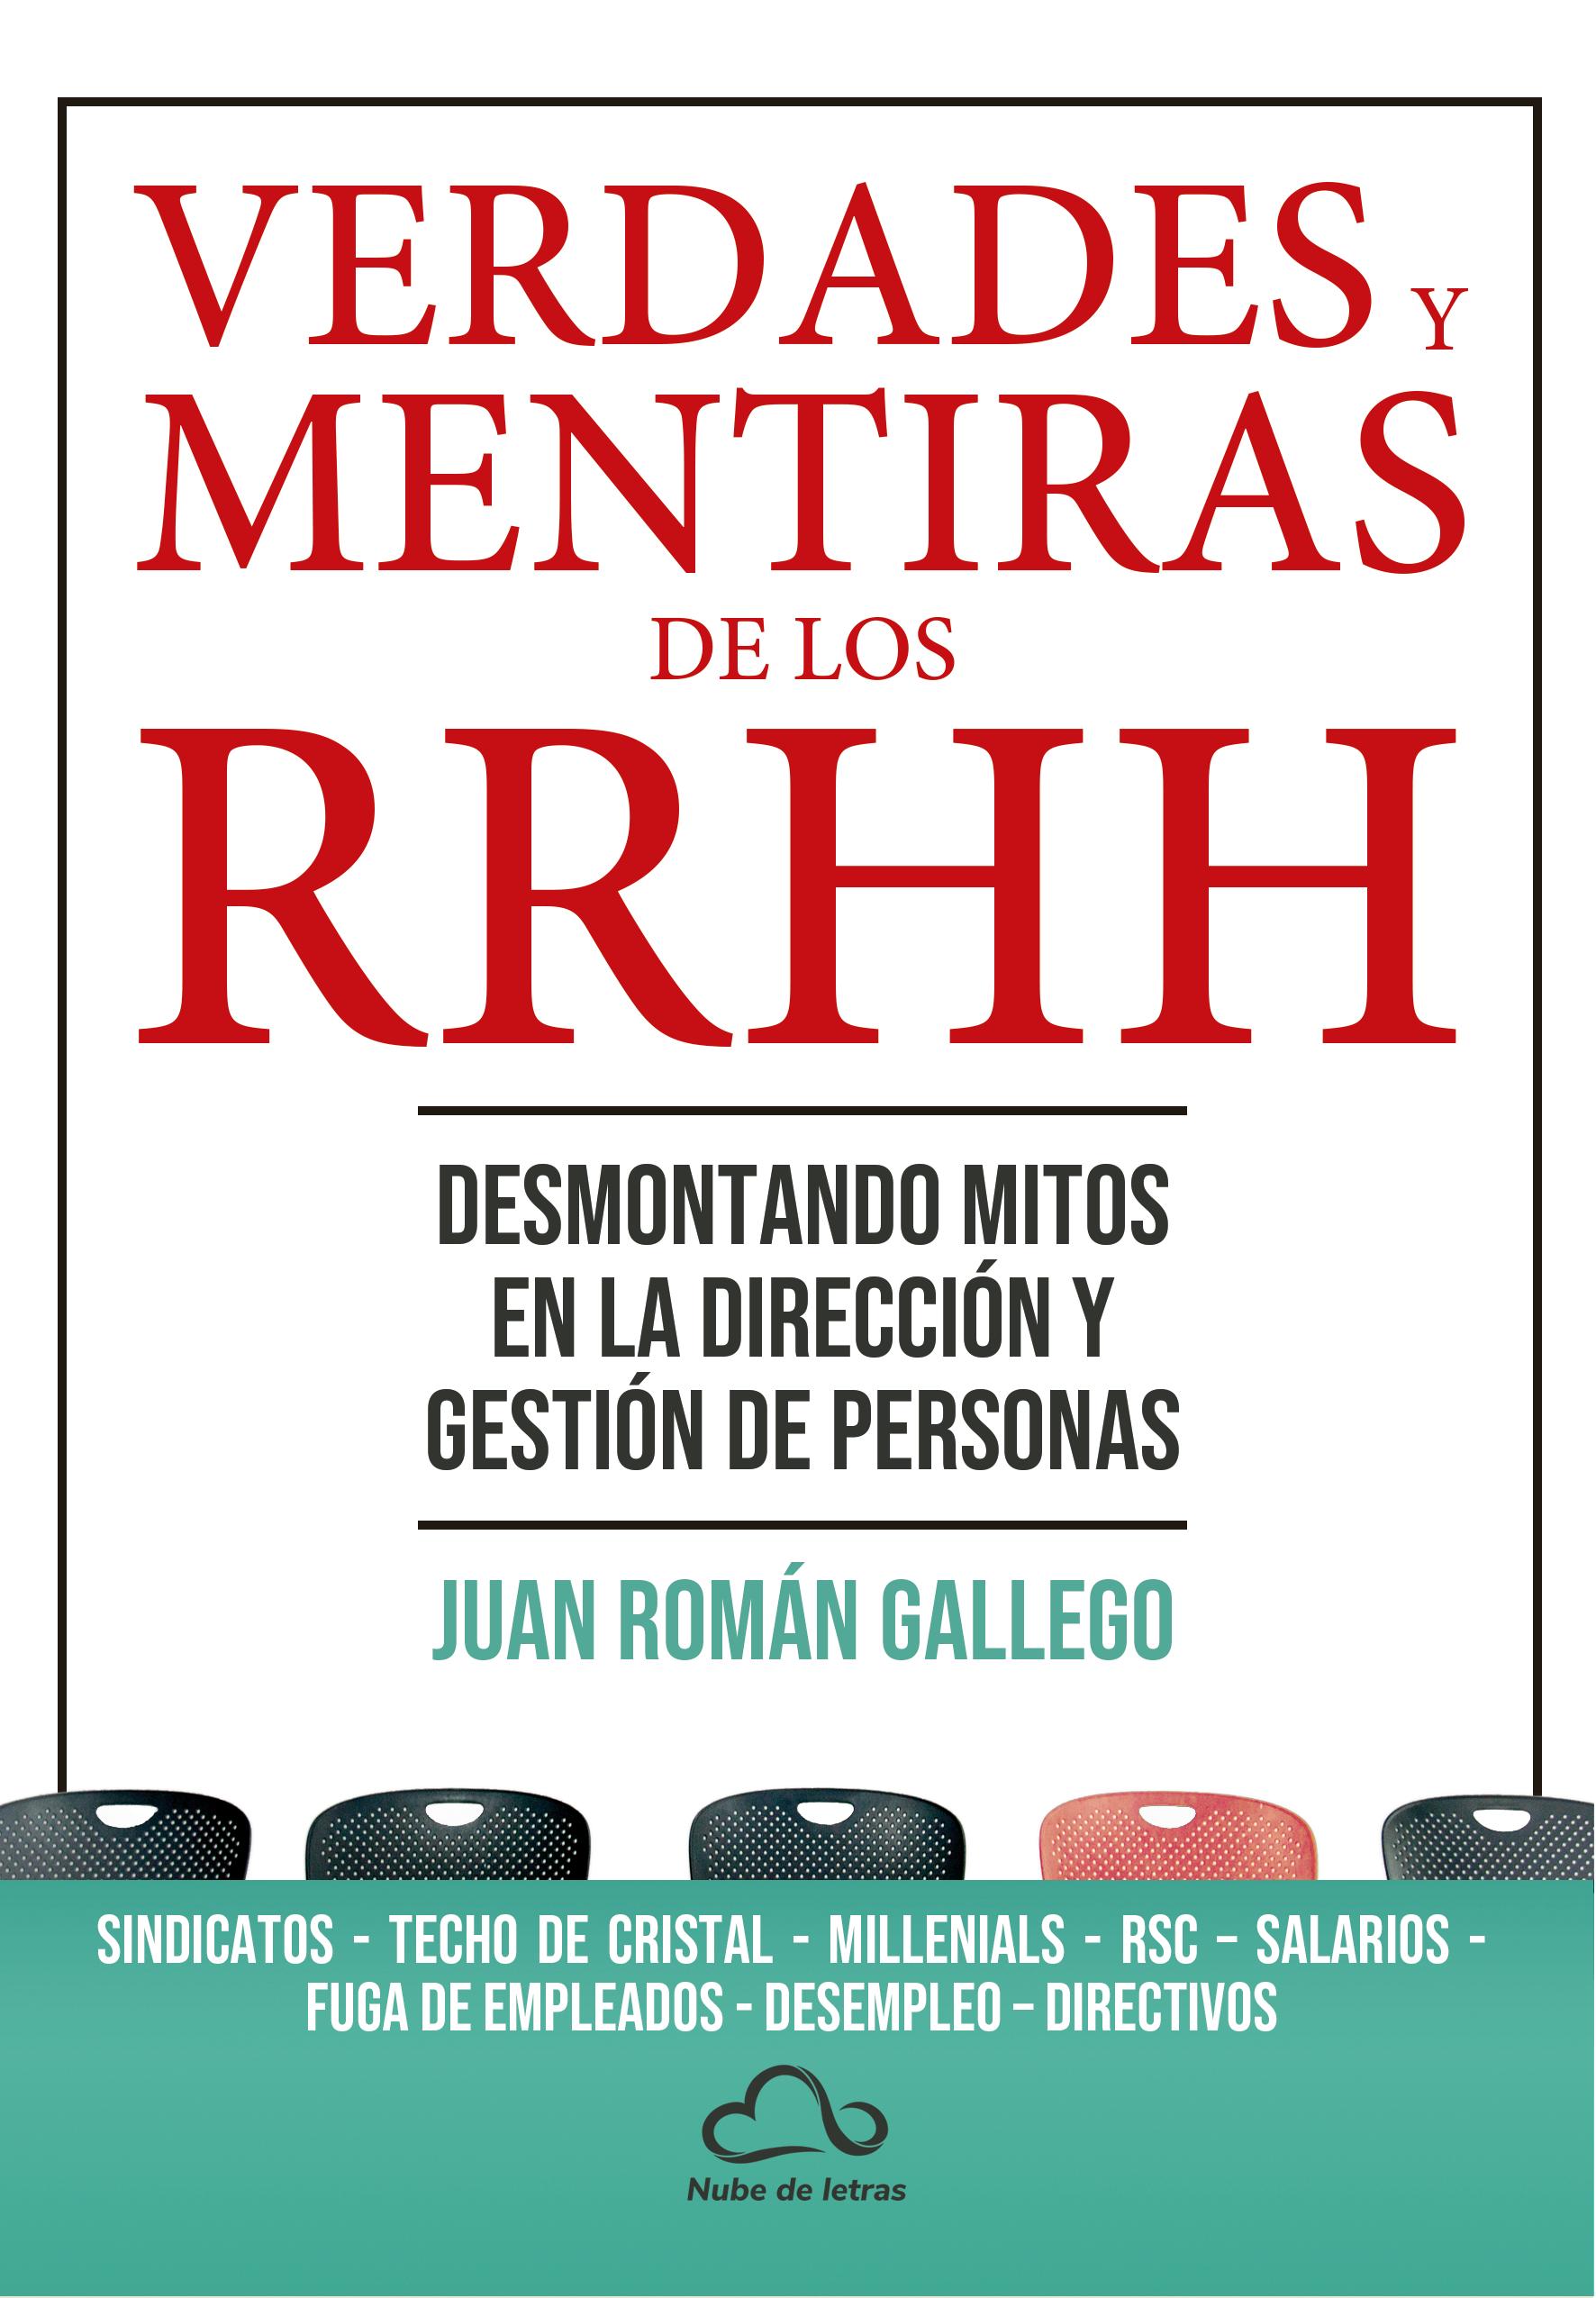 https://services.quares.es/covers/9000100207713.jpg